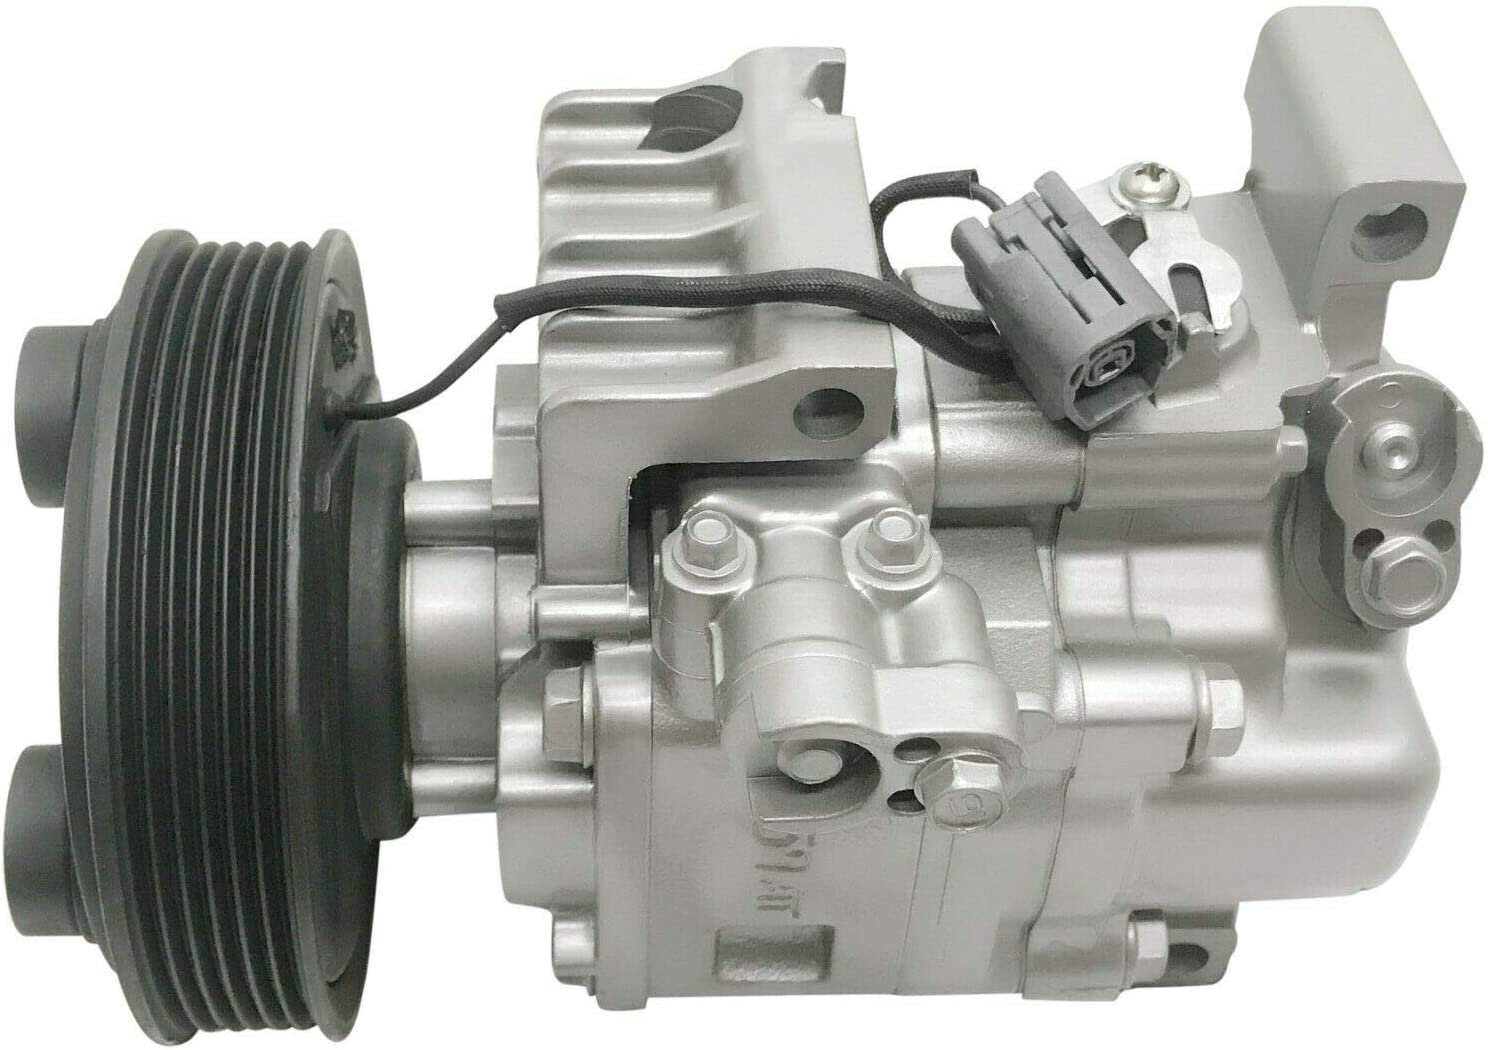 Max 58% OFF RYC Remanufactured AC Compressor and A Elegant C IG470 Clutch